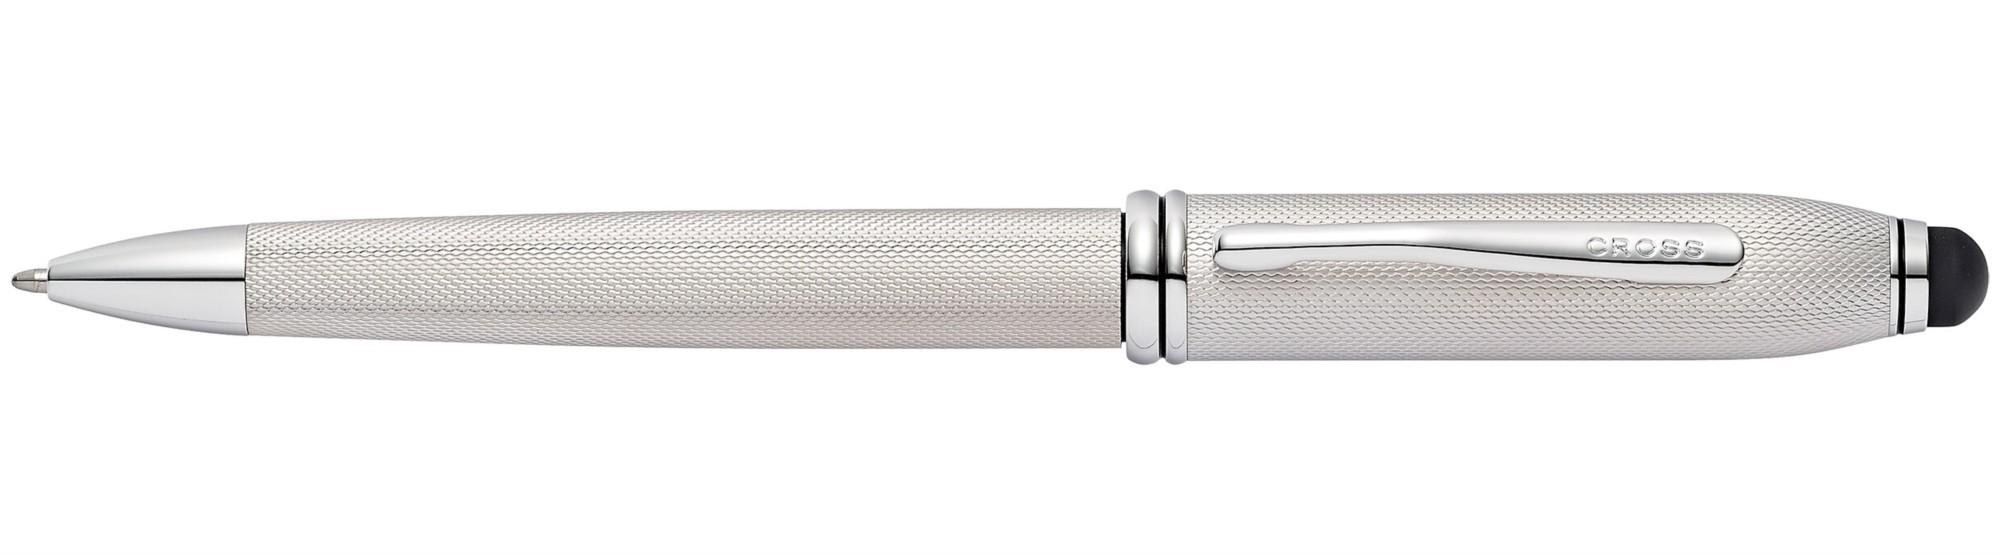 Шариковая ручка со стилусом Townsend Engraved Platinum Plate